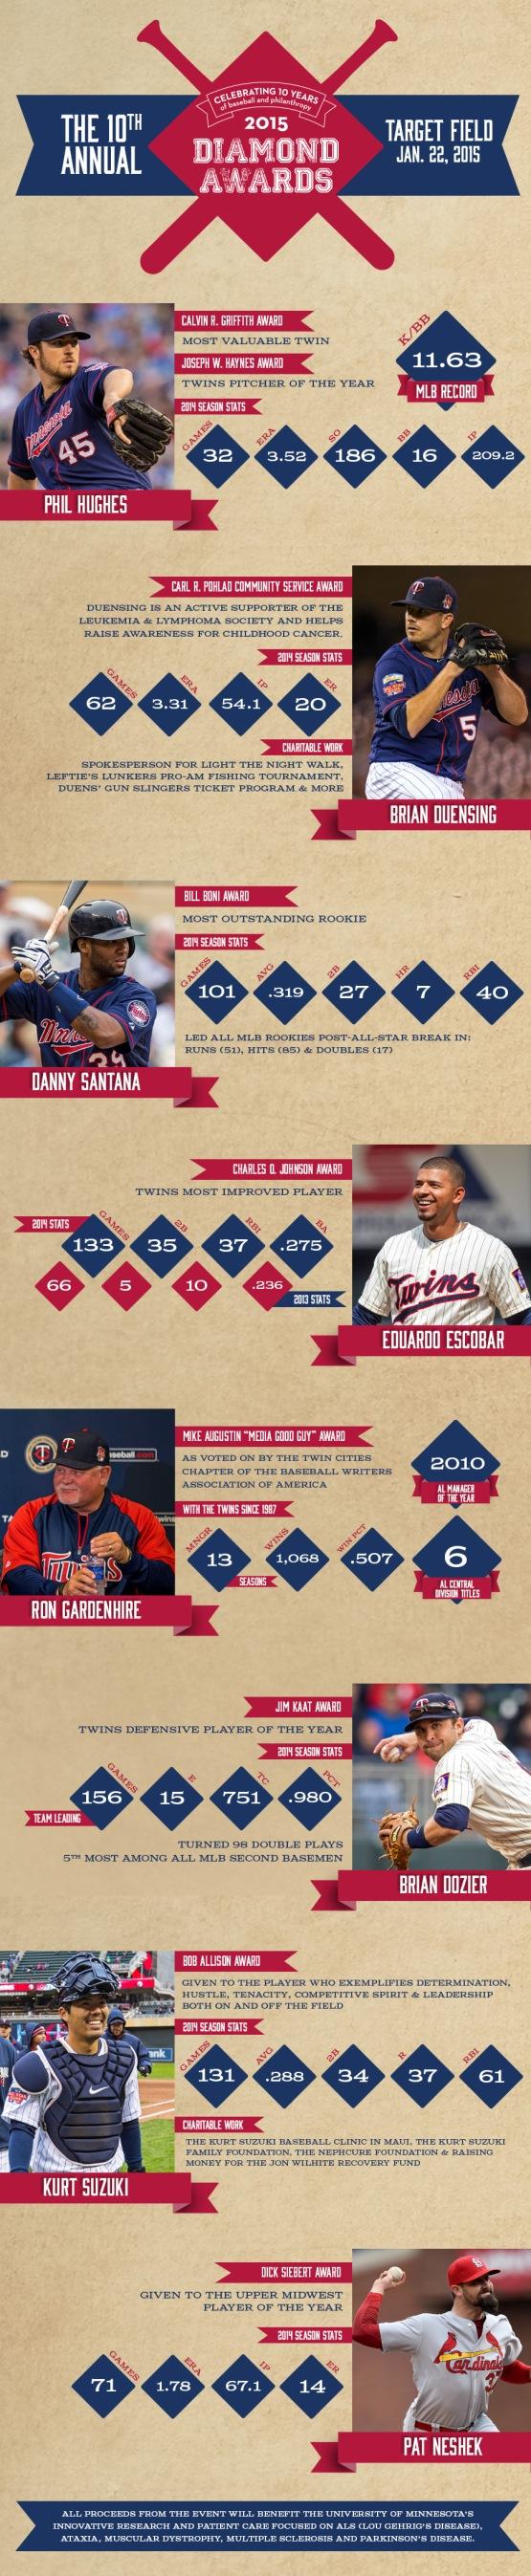 Diamond Awards infographic